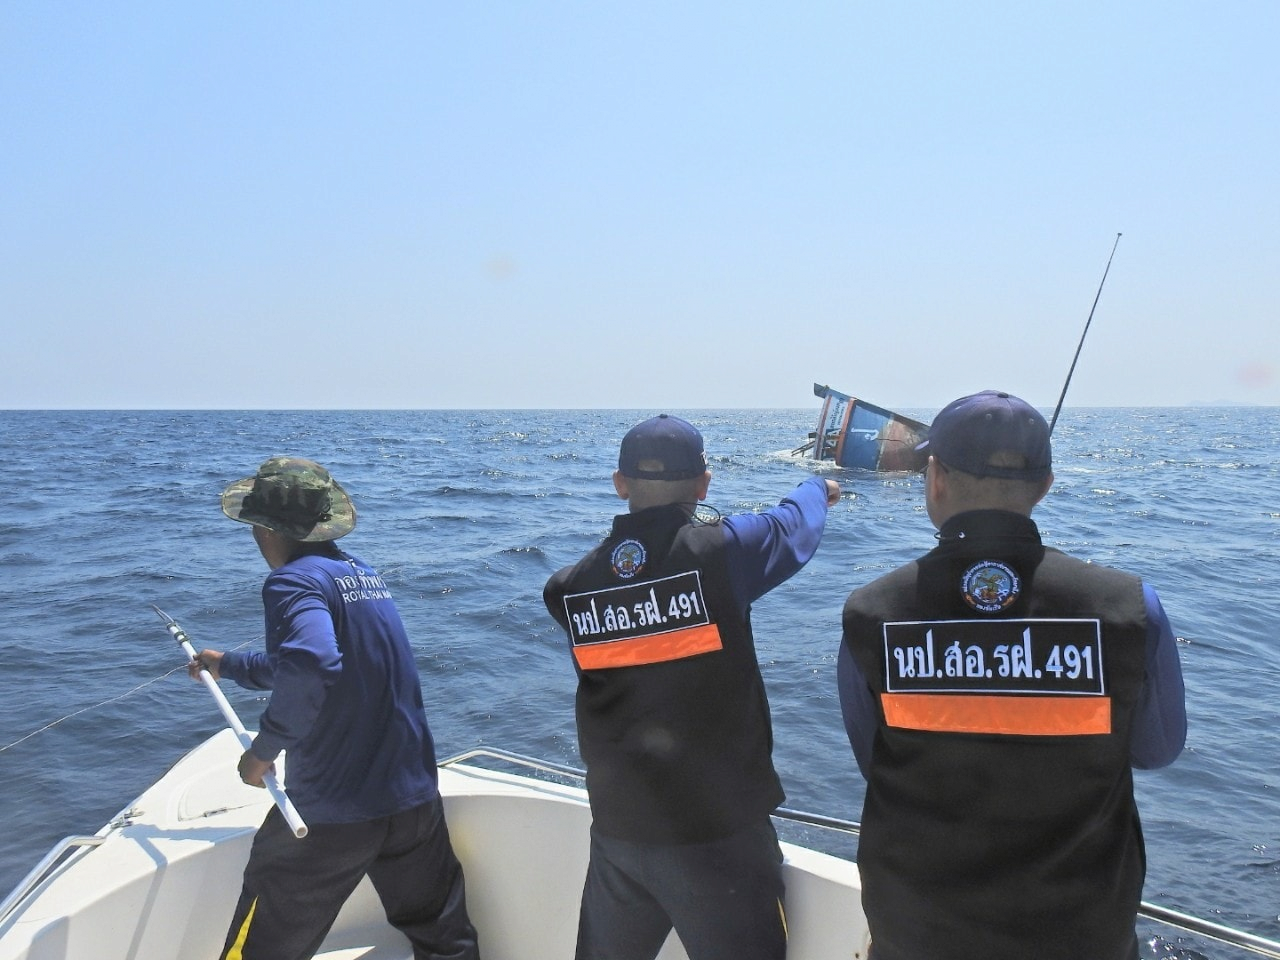 image.png 태국 해군 근황